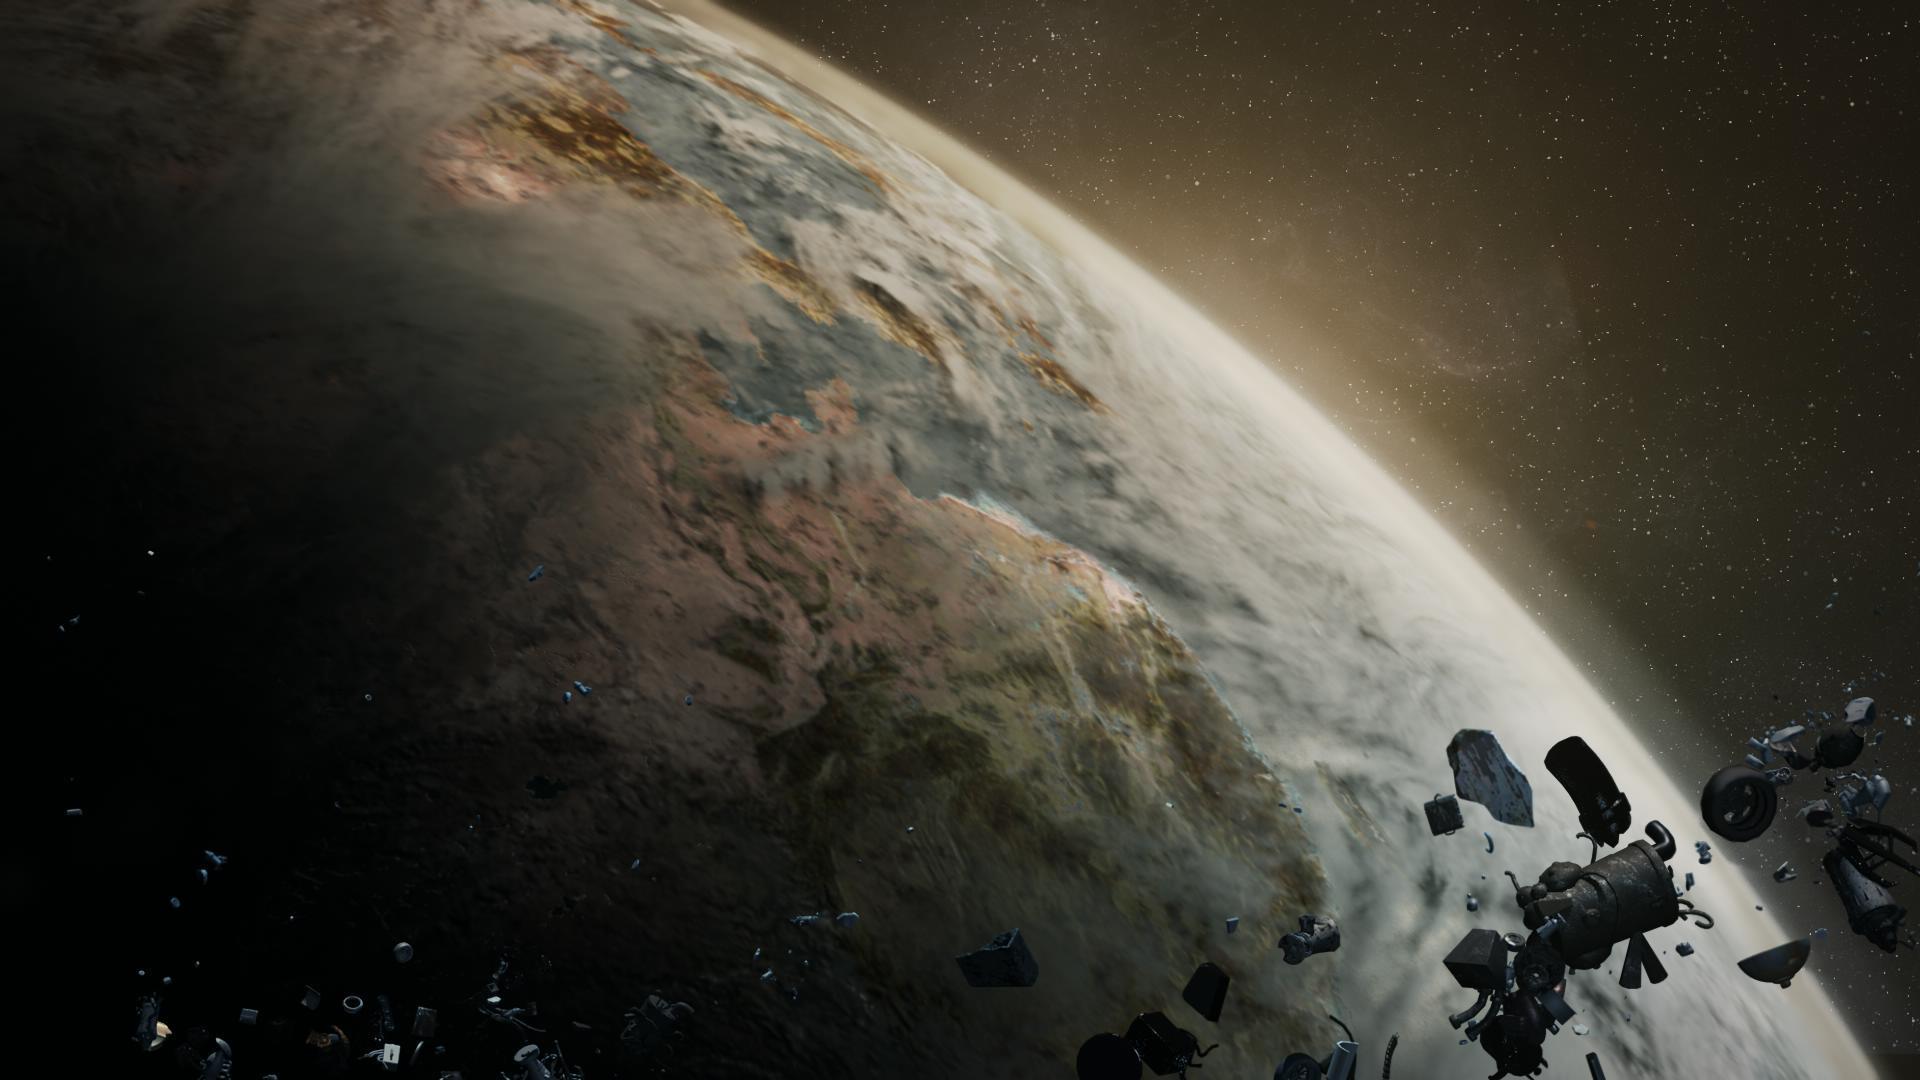 c4d太空环境&污染地球制作 动画短片《orbit》镜头